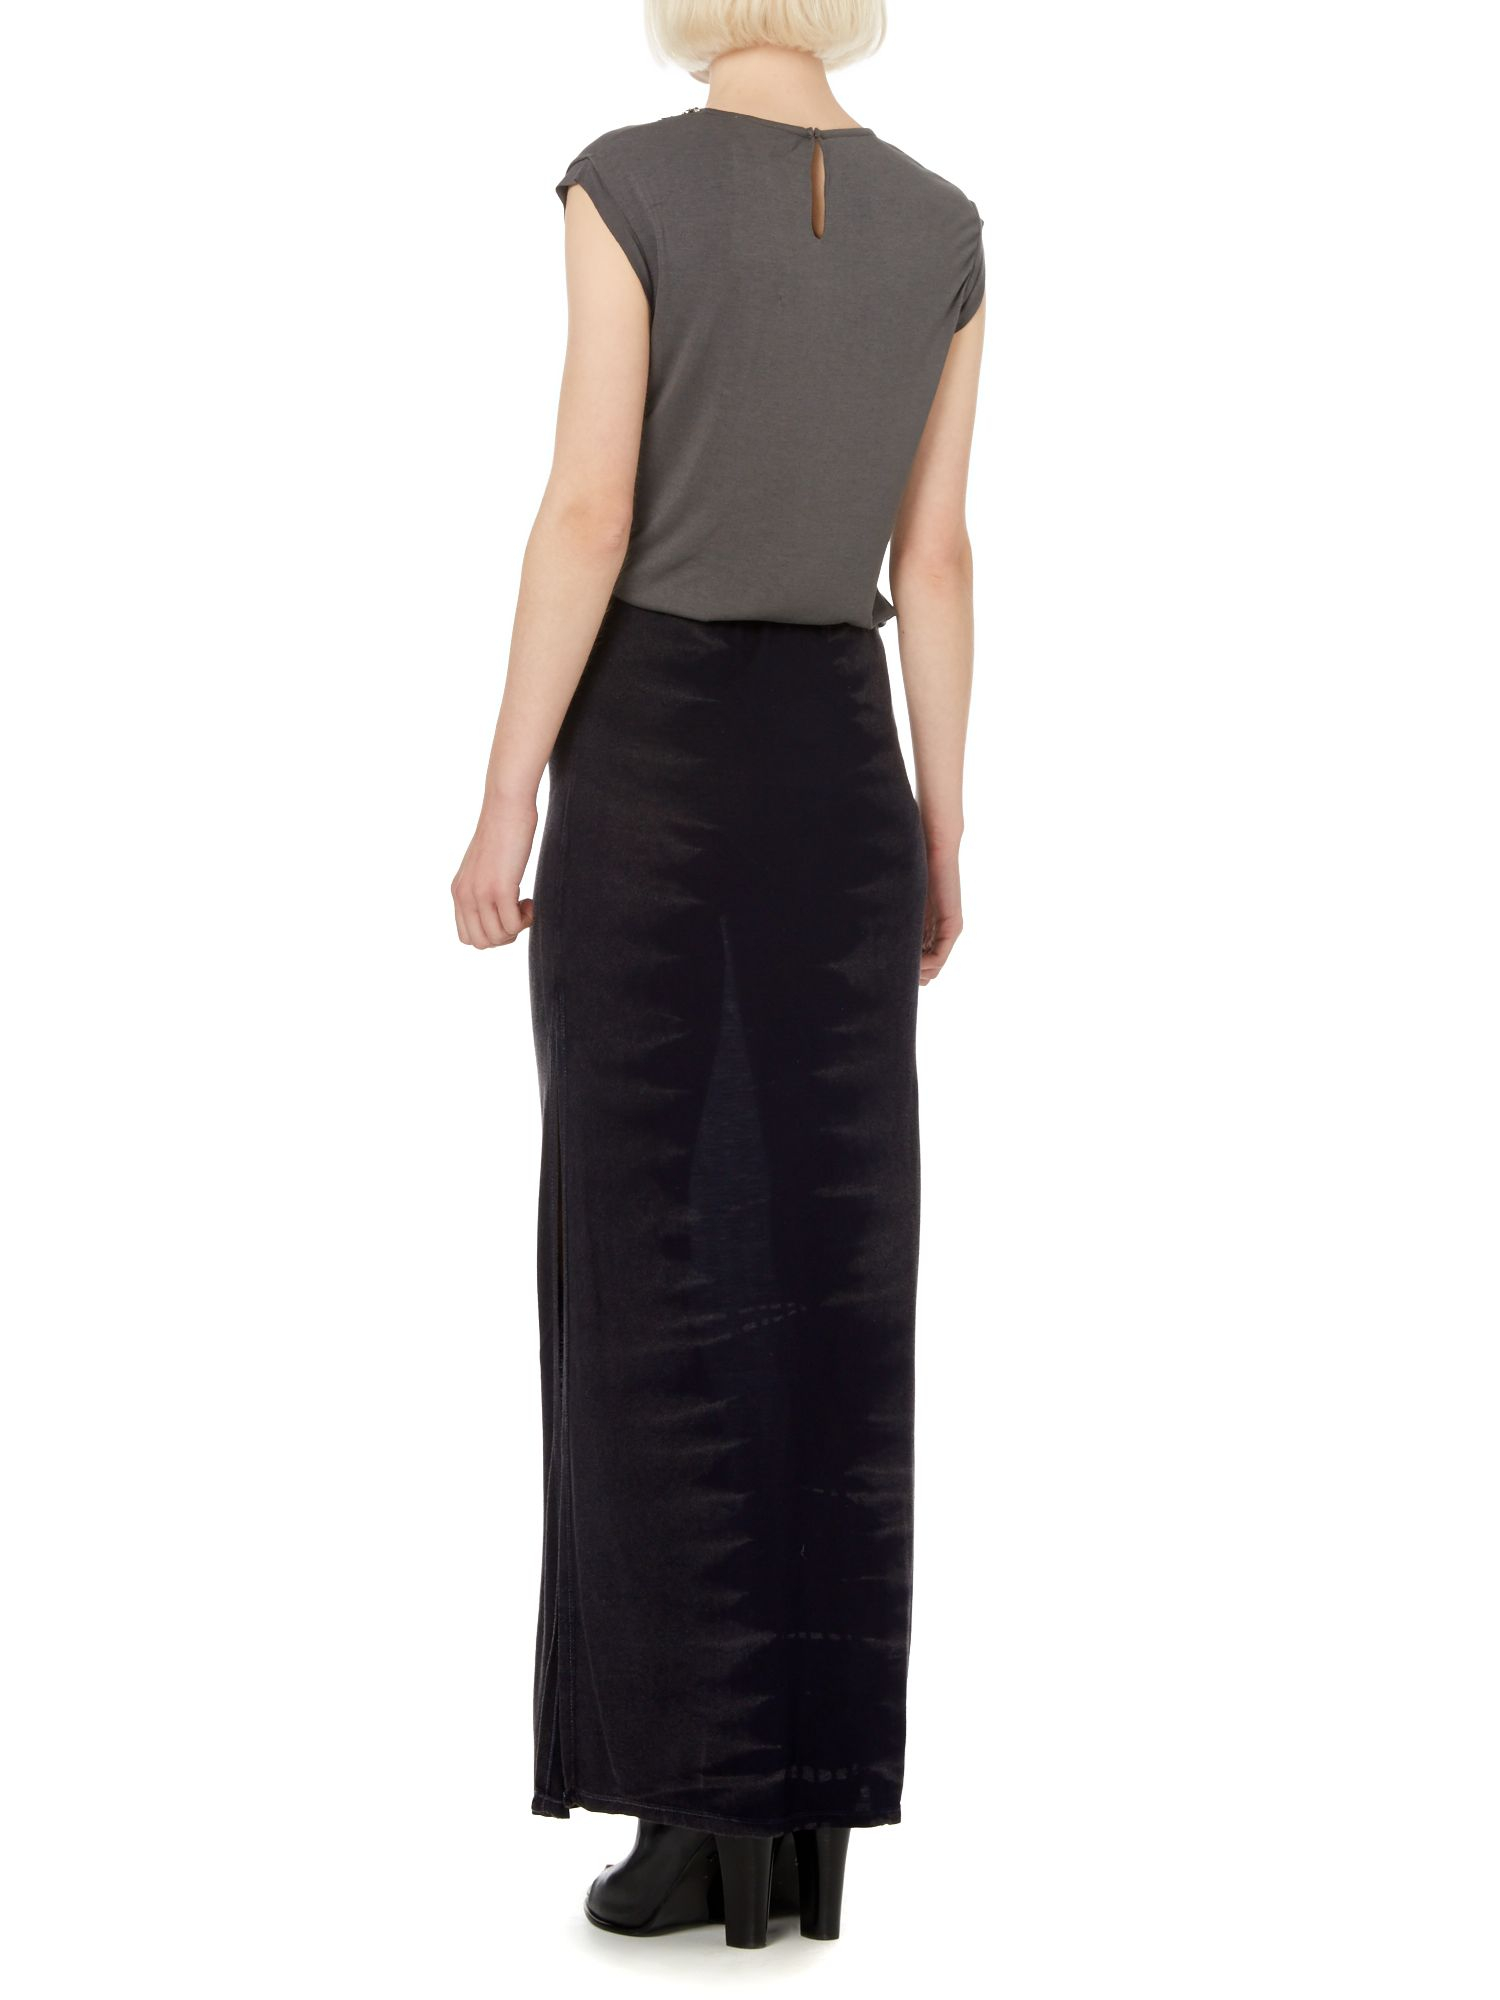 label lab tie dye jersey maxi skirt in gray lyst